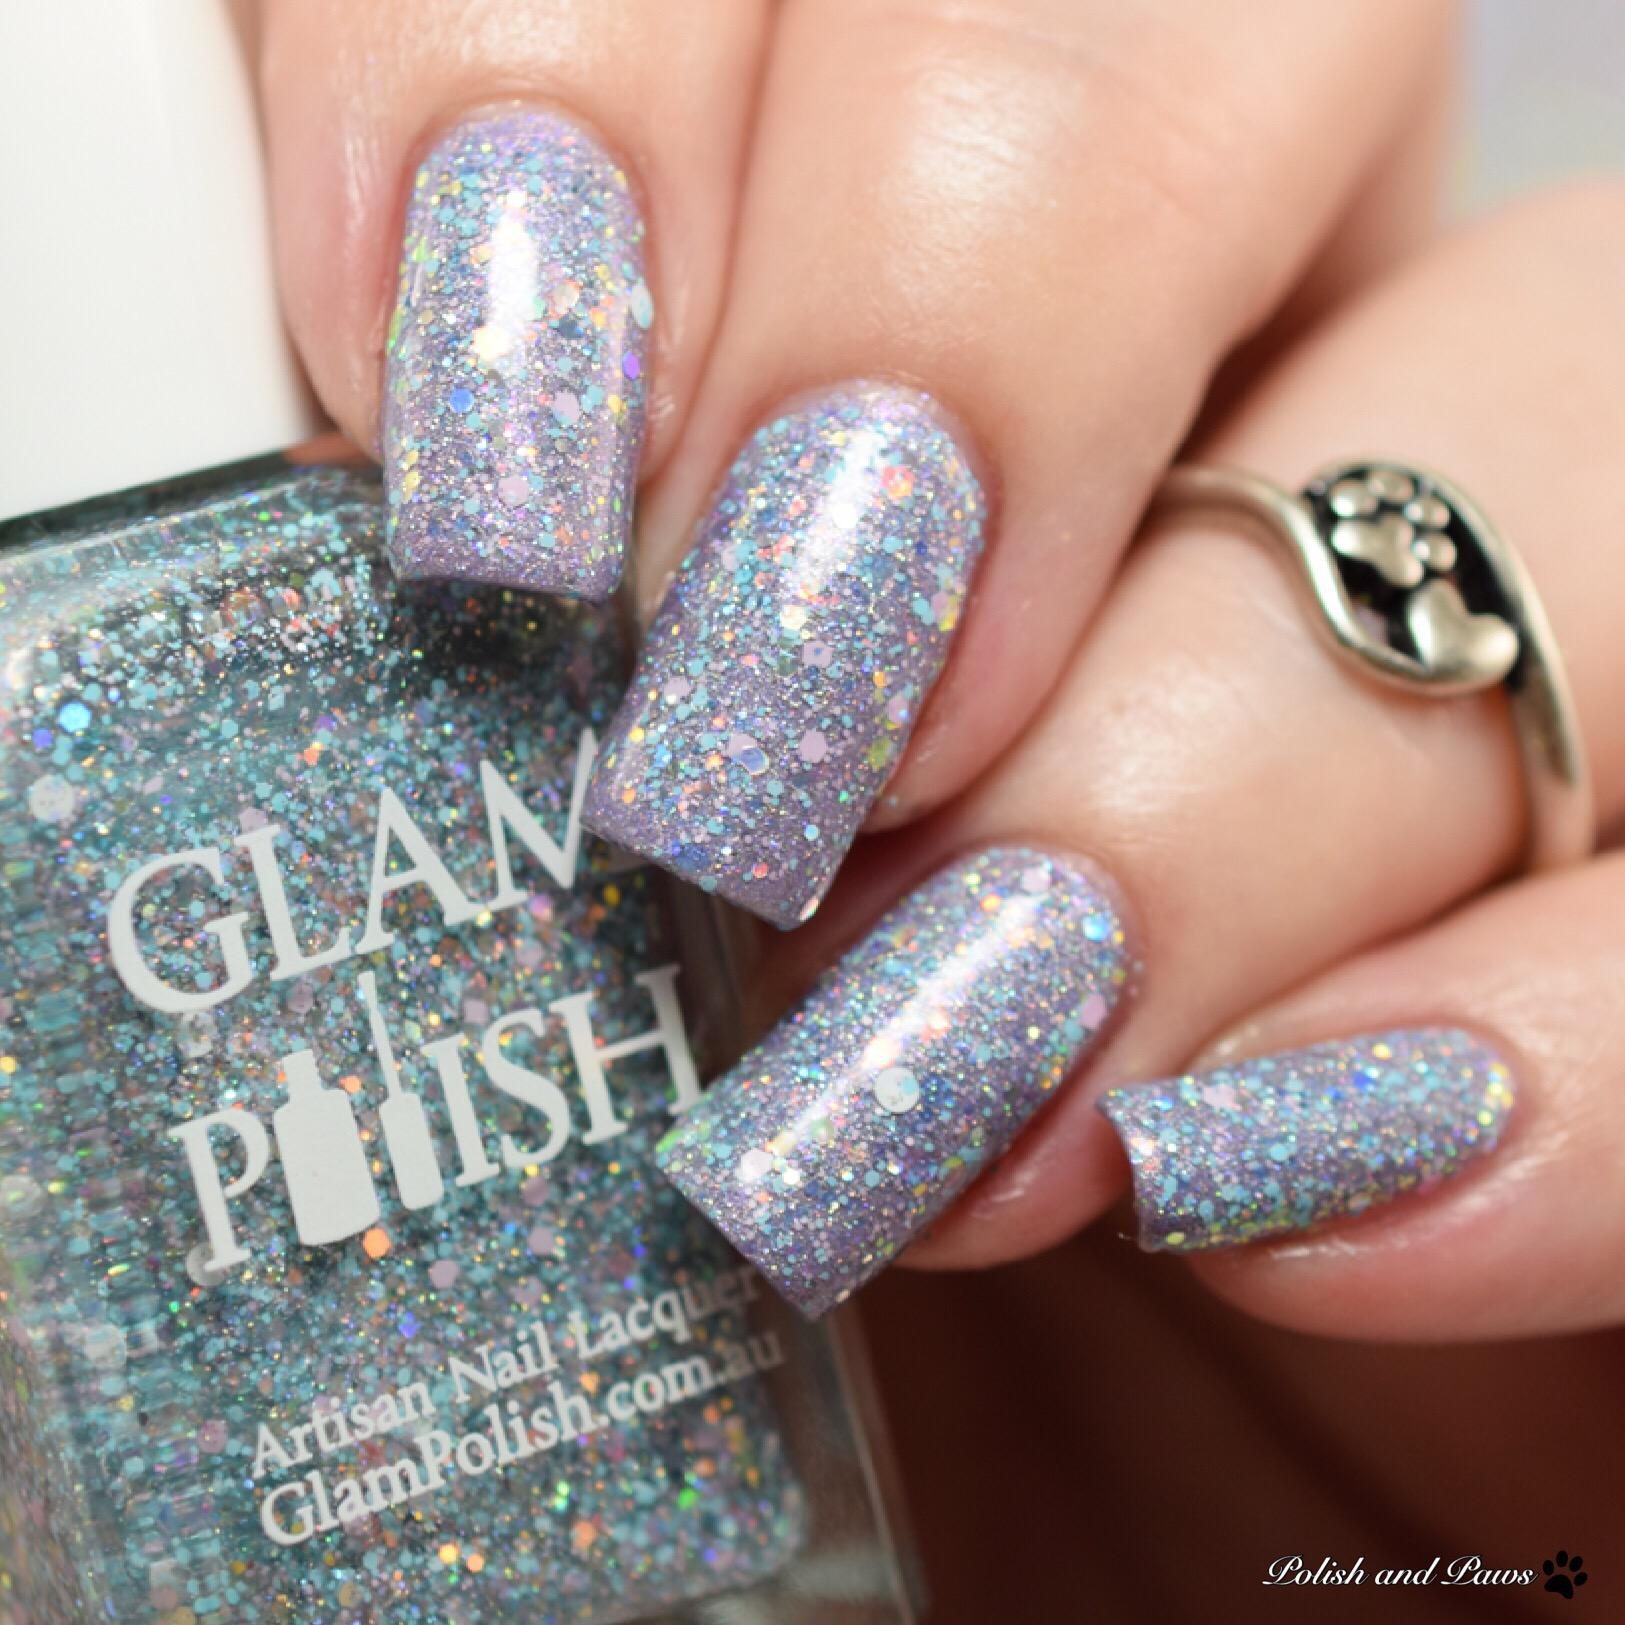 Glam Polish Every Witch Way